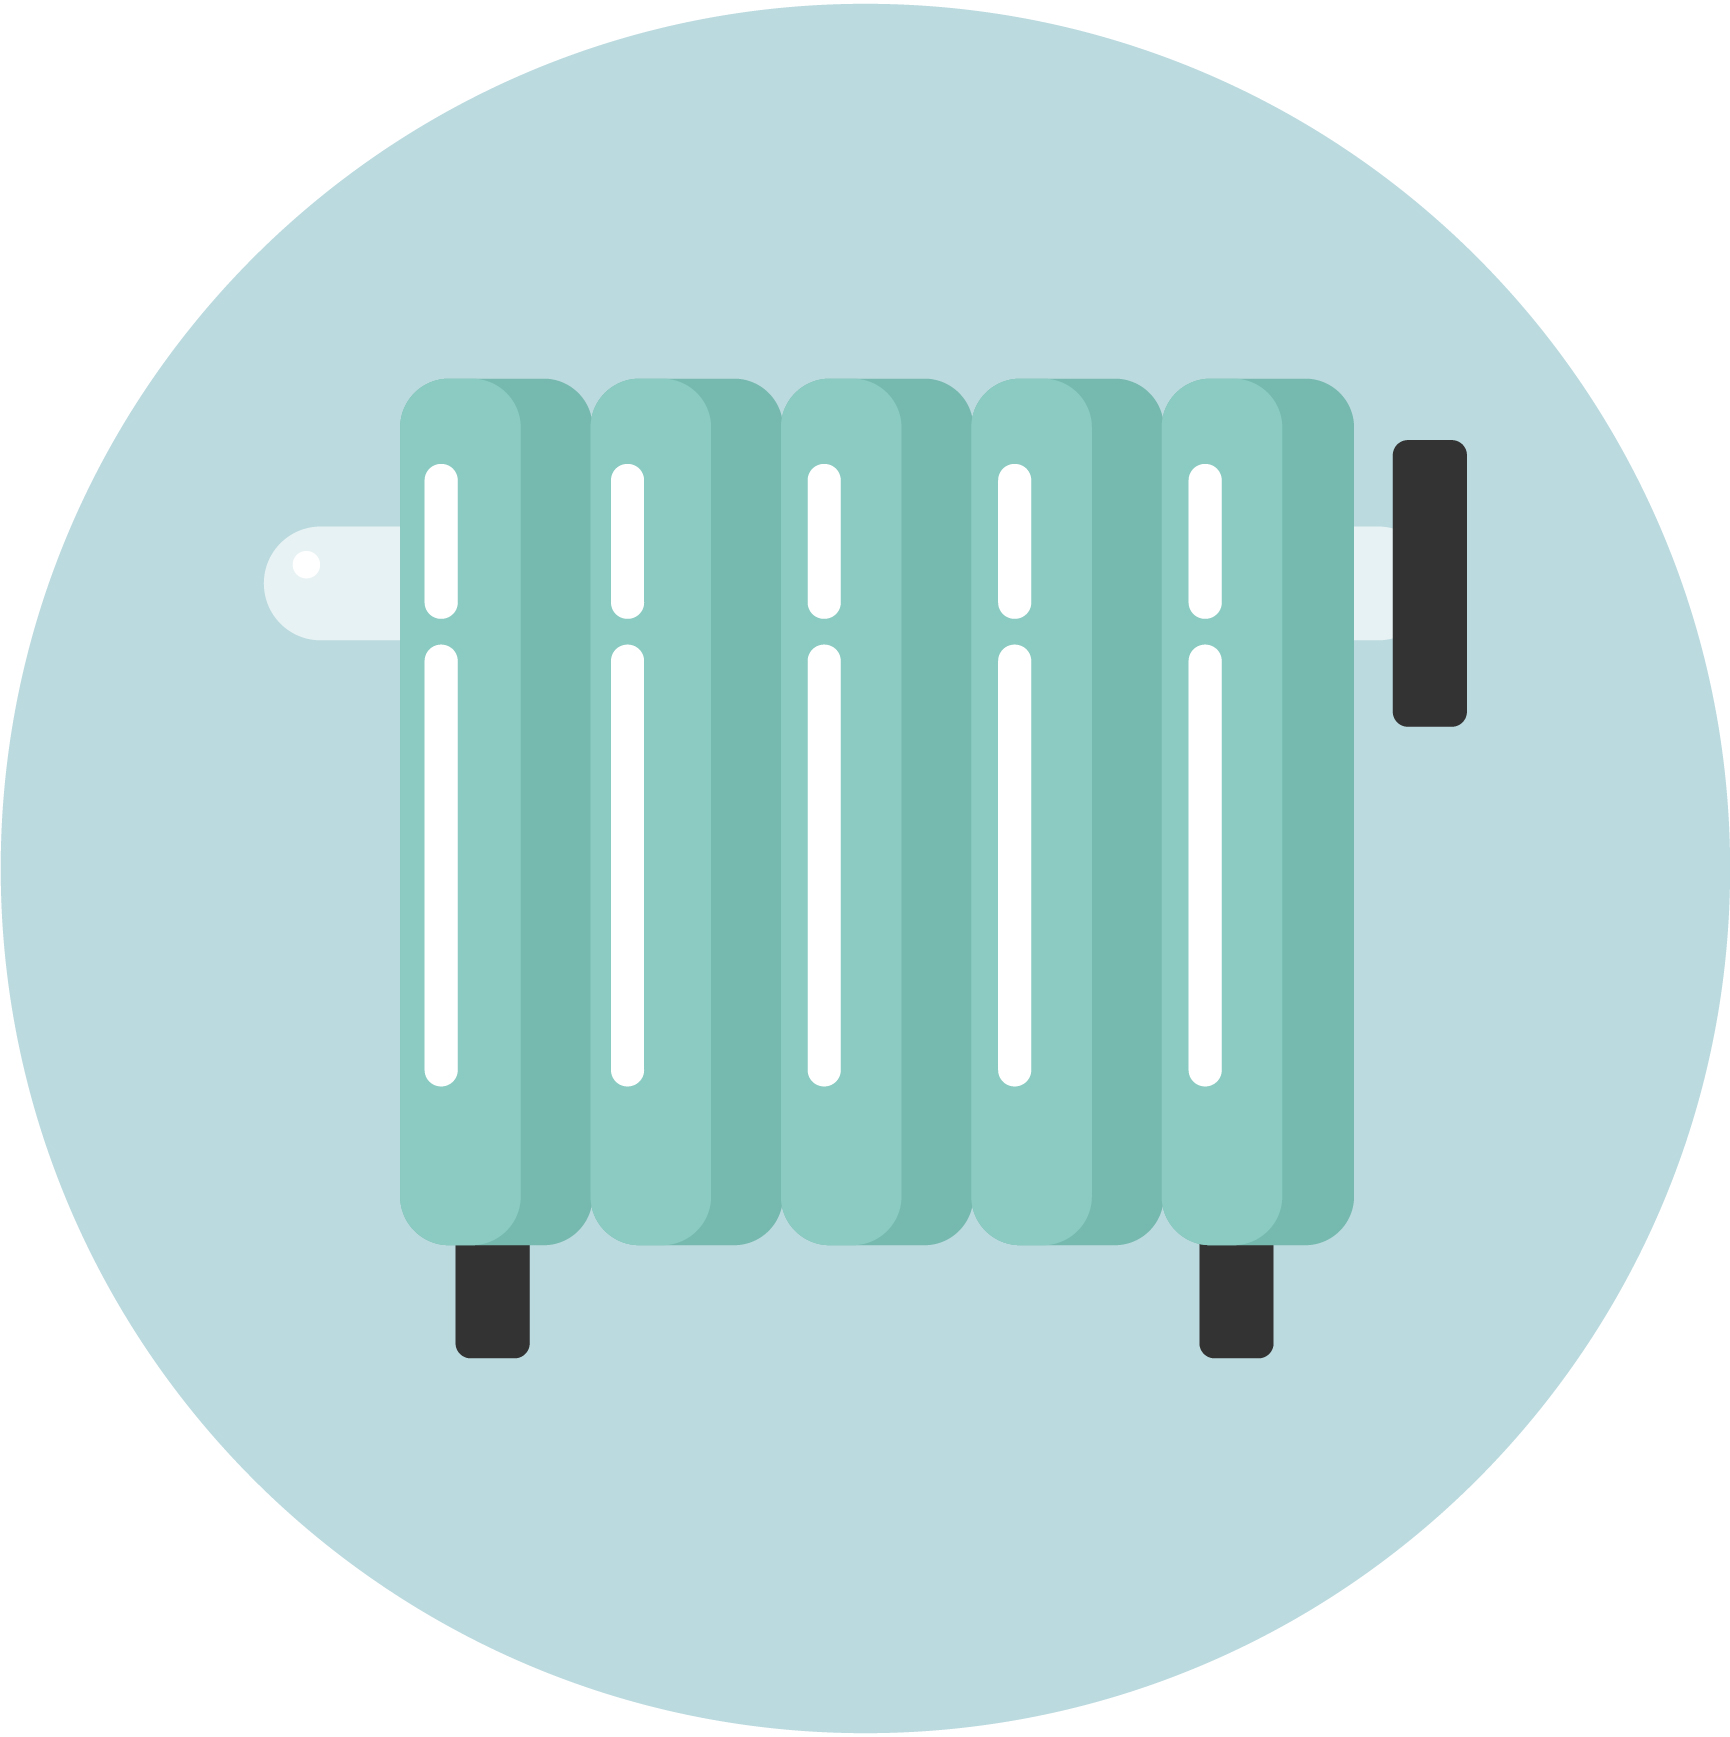 Charte environnementale chauffage